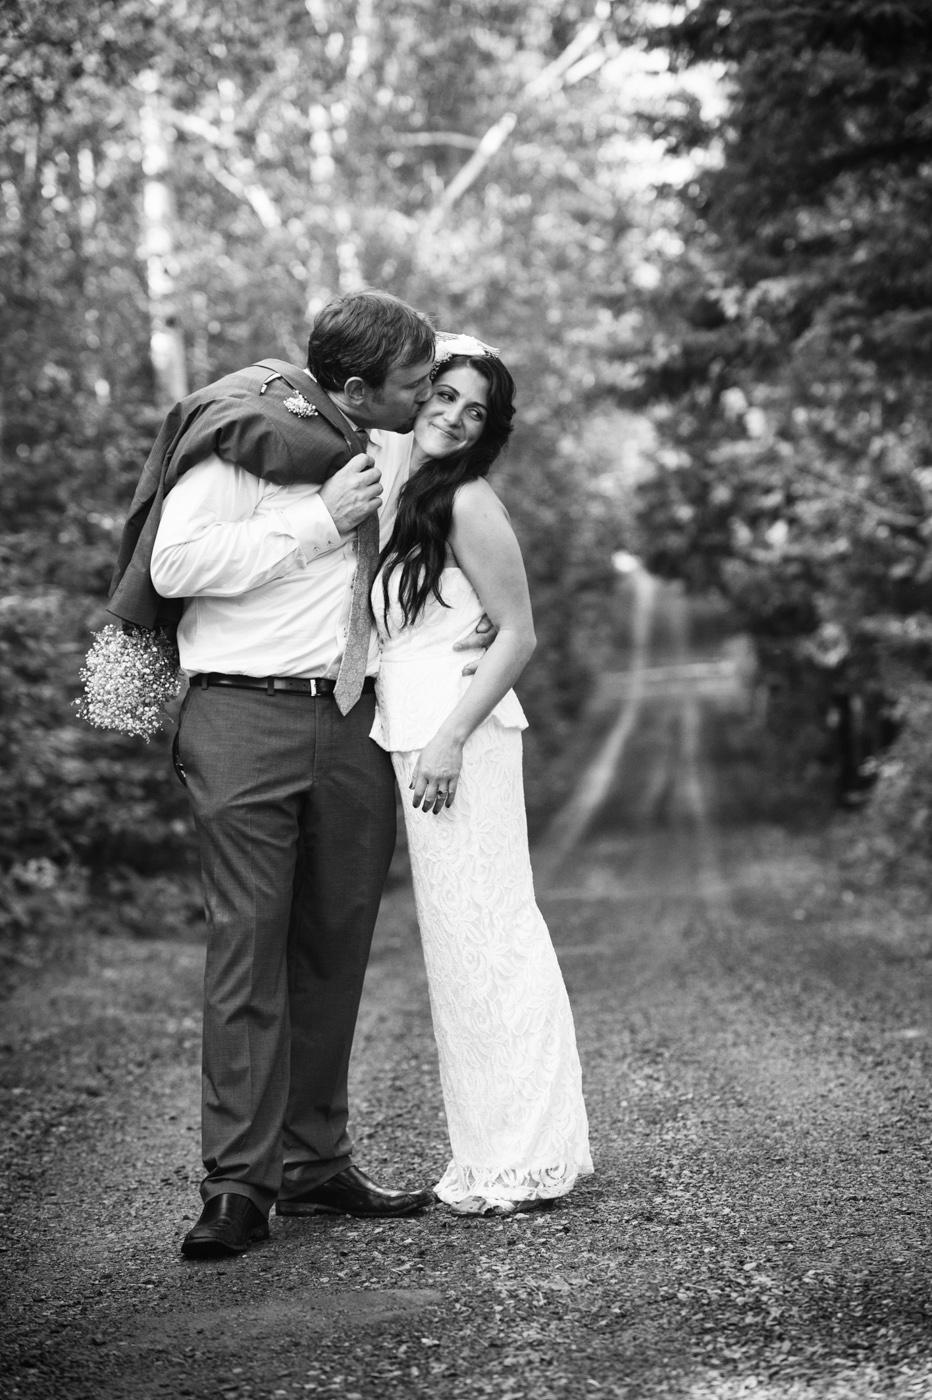 ss_weddingbest-23.jpg